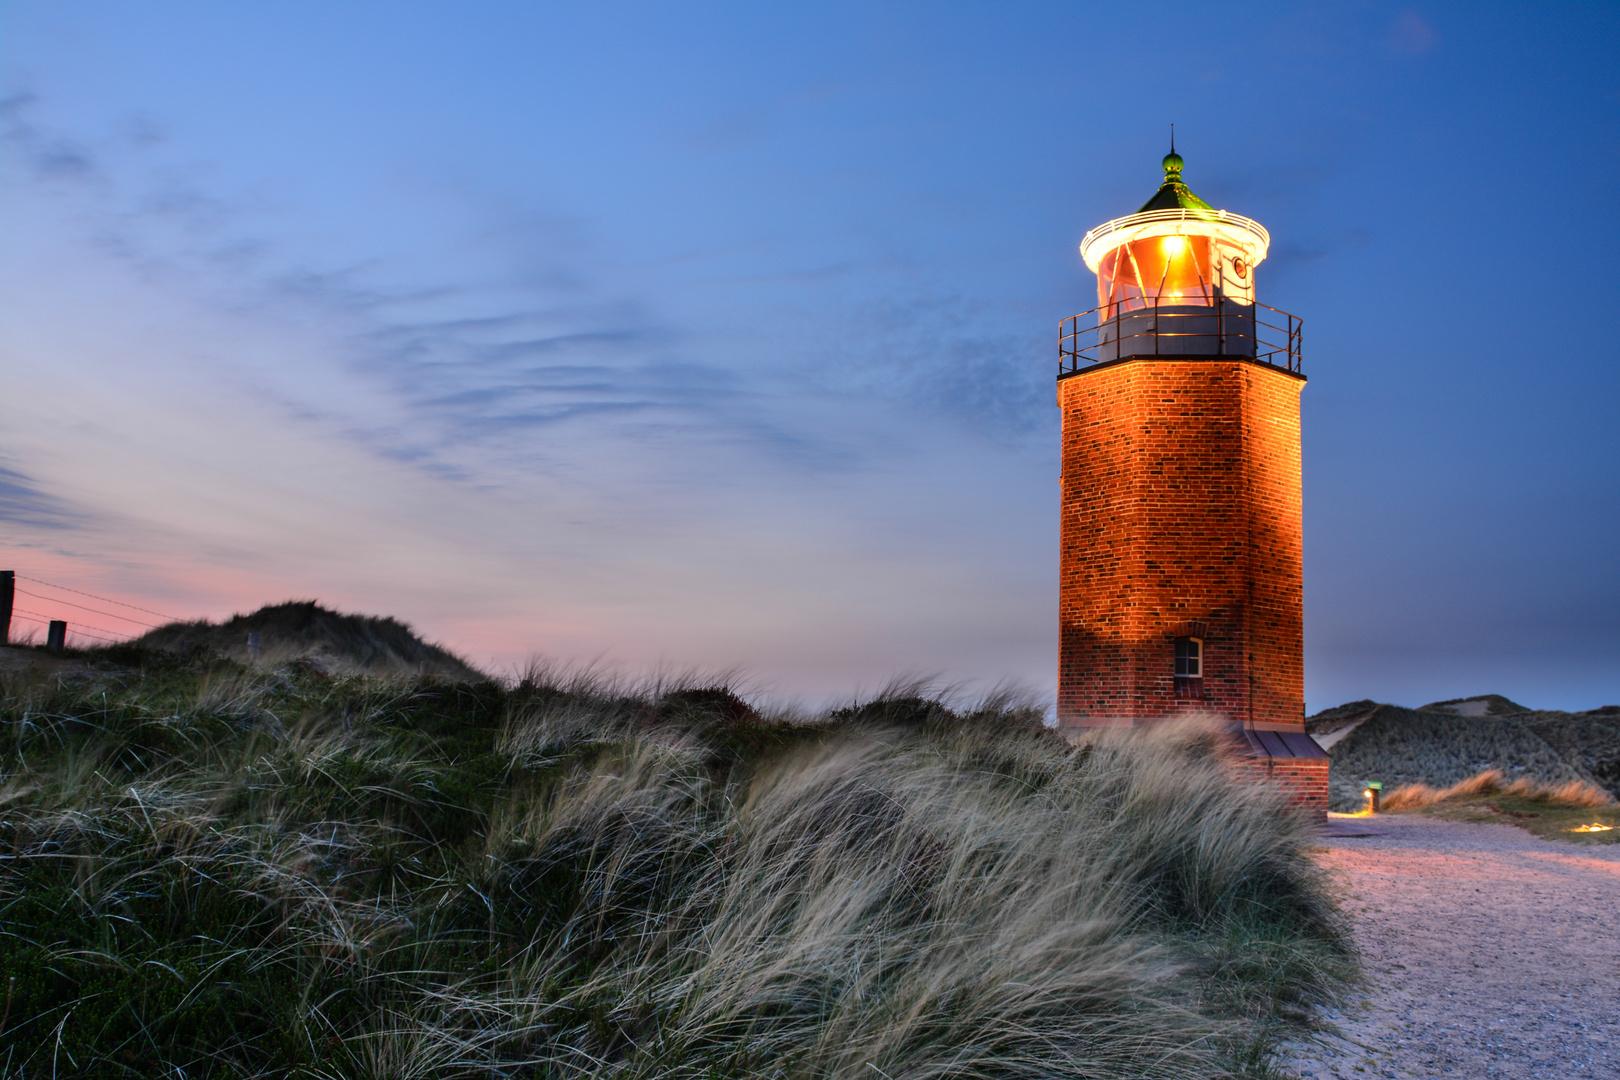 Quermarkenfeuer Rotes Kliff - Kampen - Sylt 2013 HDR